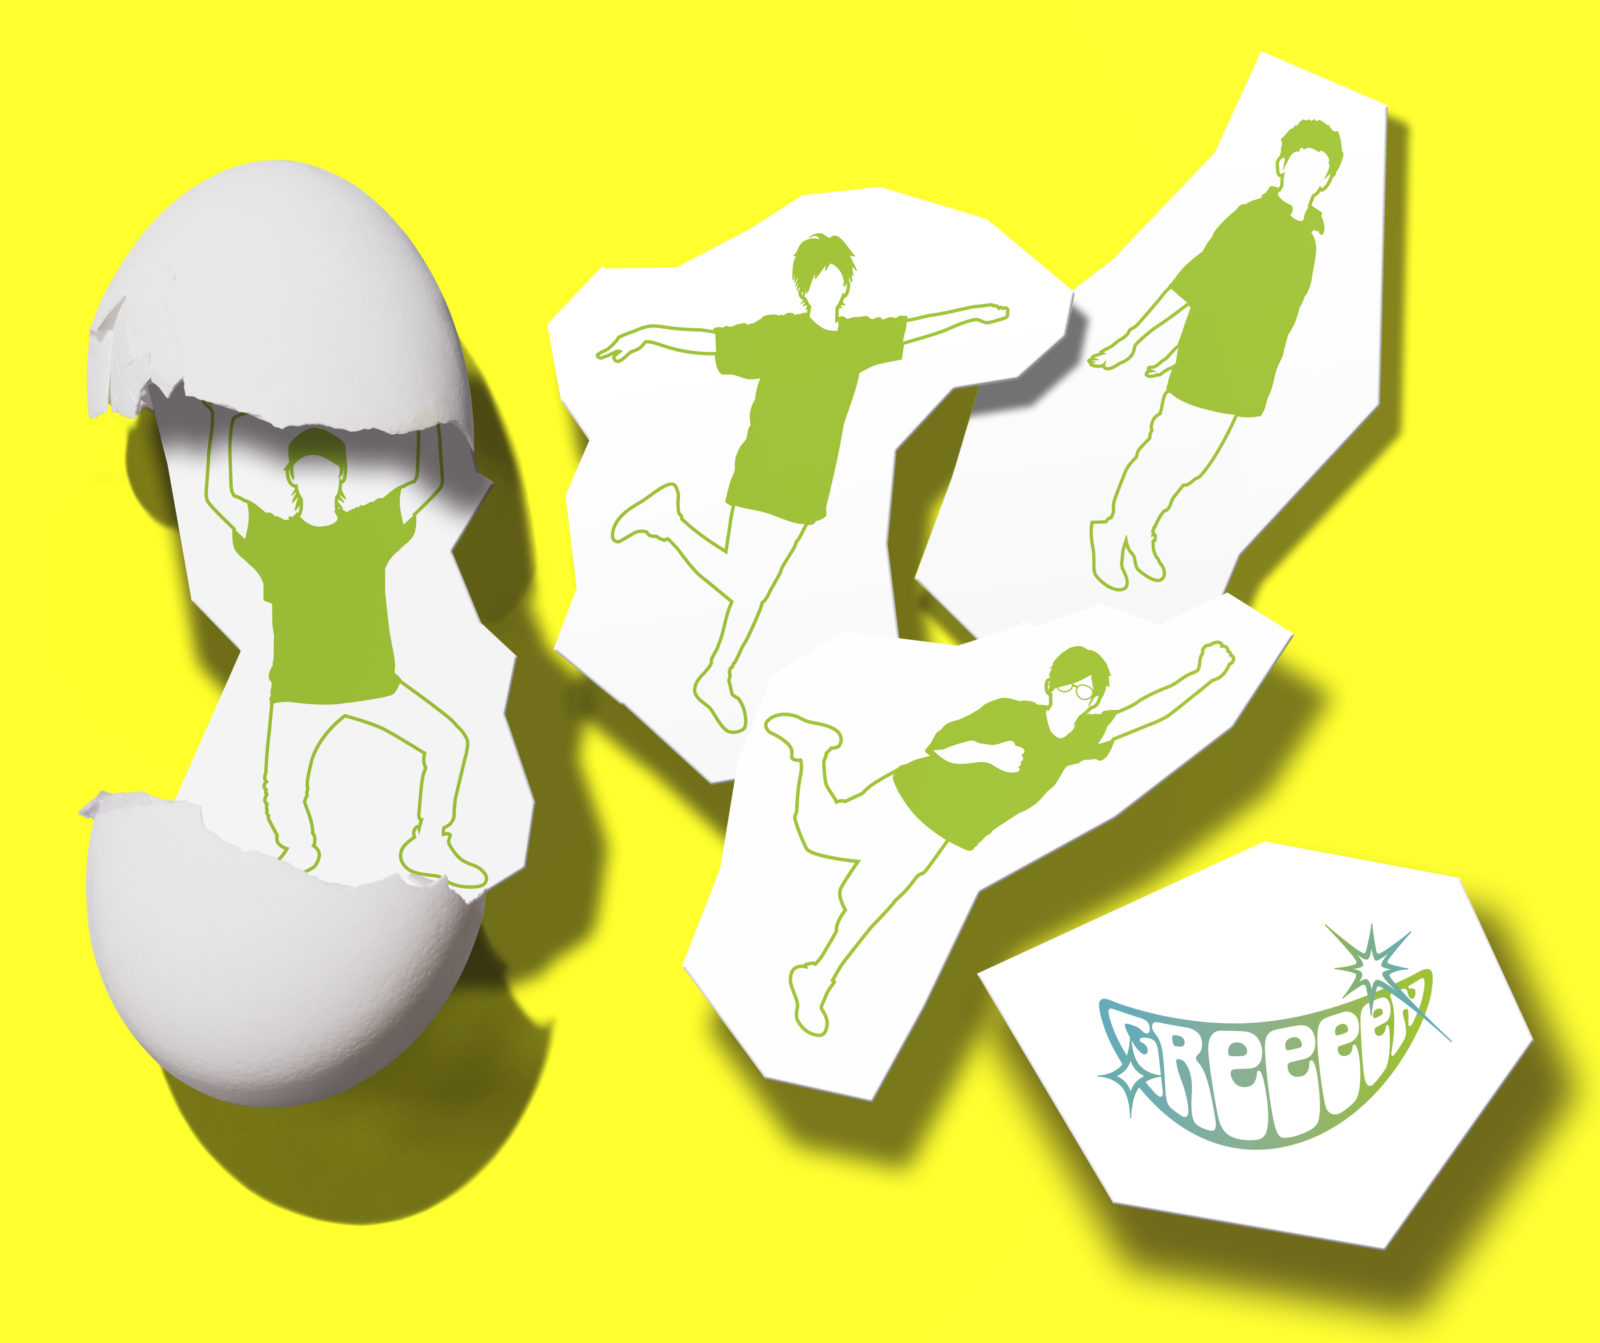 GReeeeNニューアルバム「第九」発売記念!全国のラジオ番組にコメント出演サムネイル画像